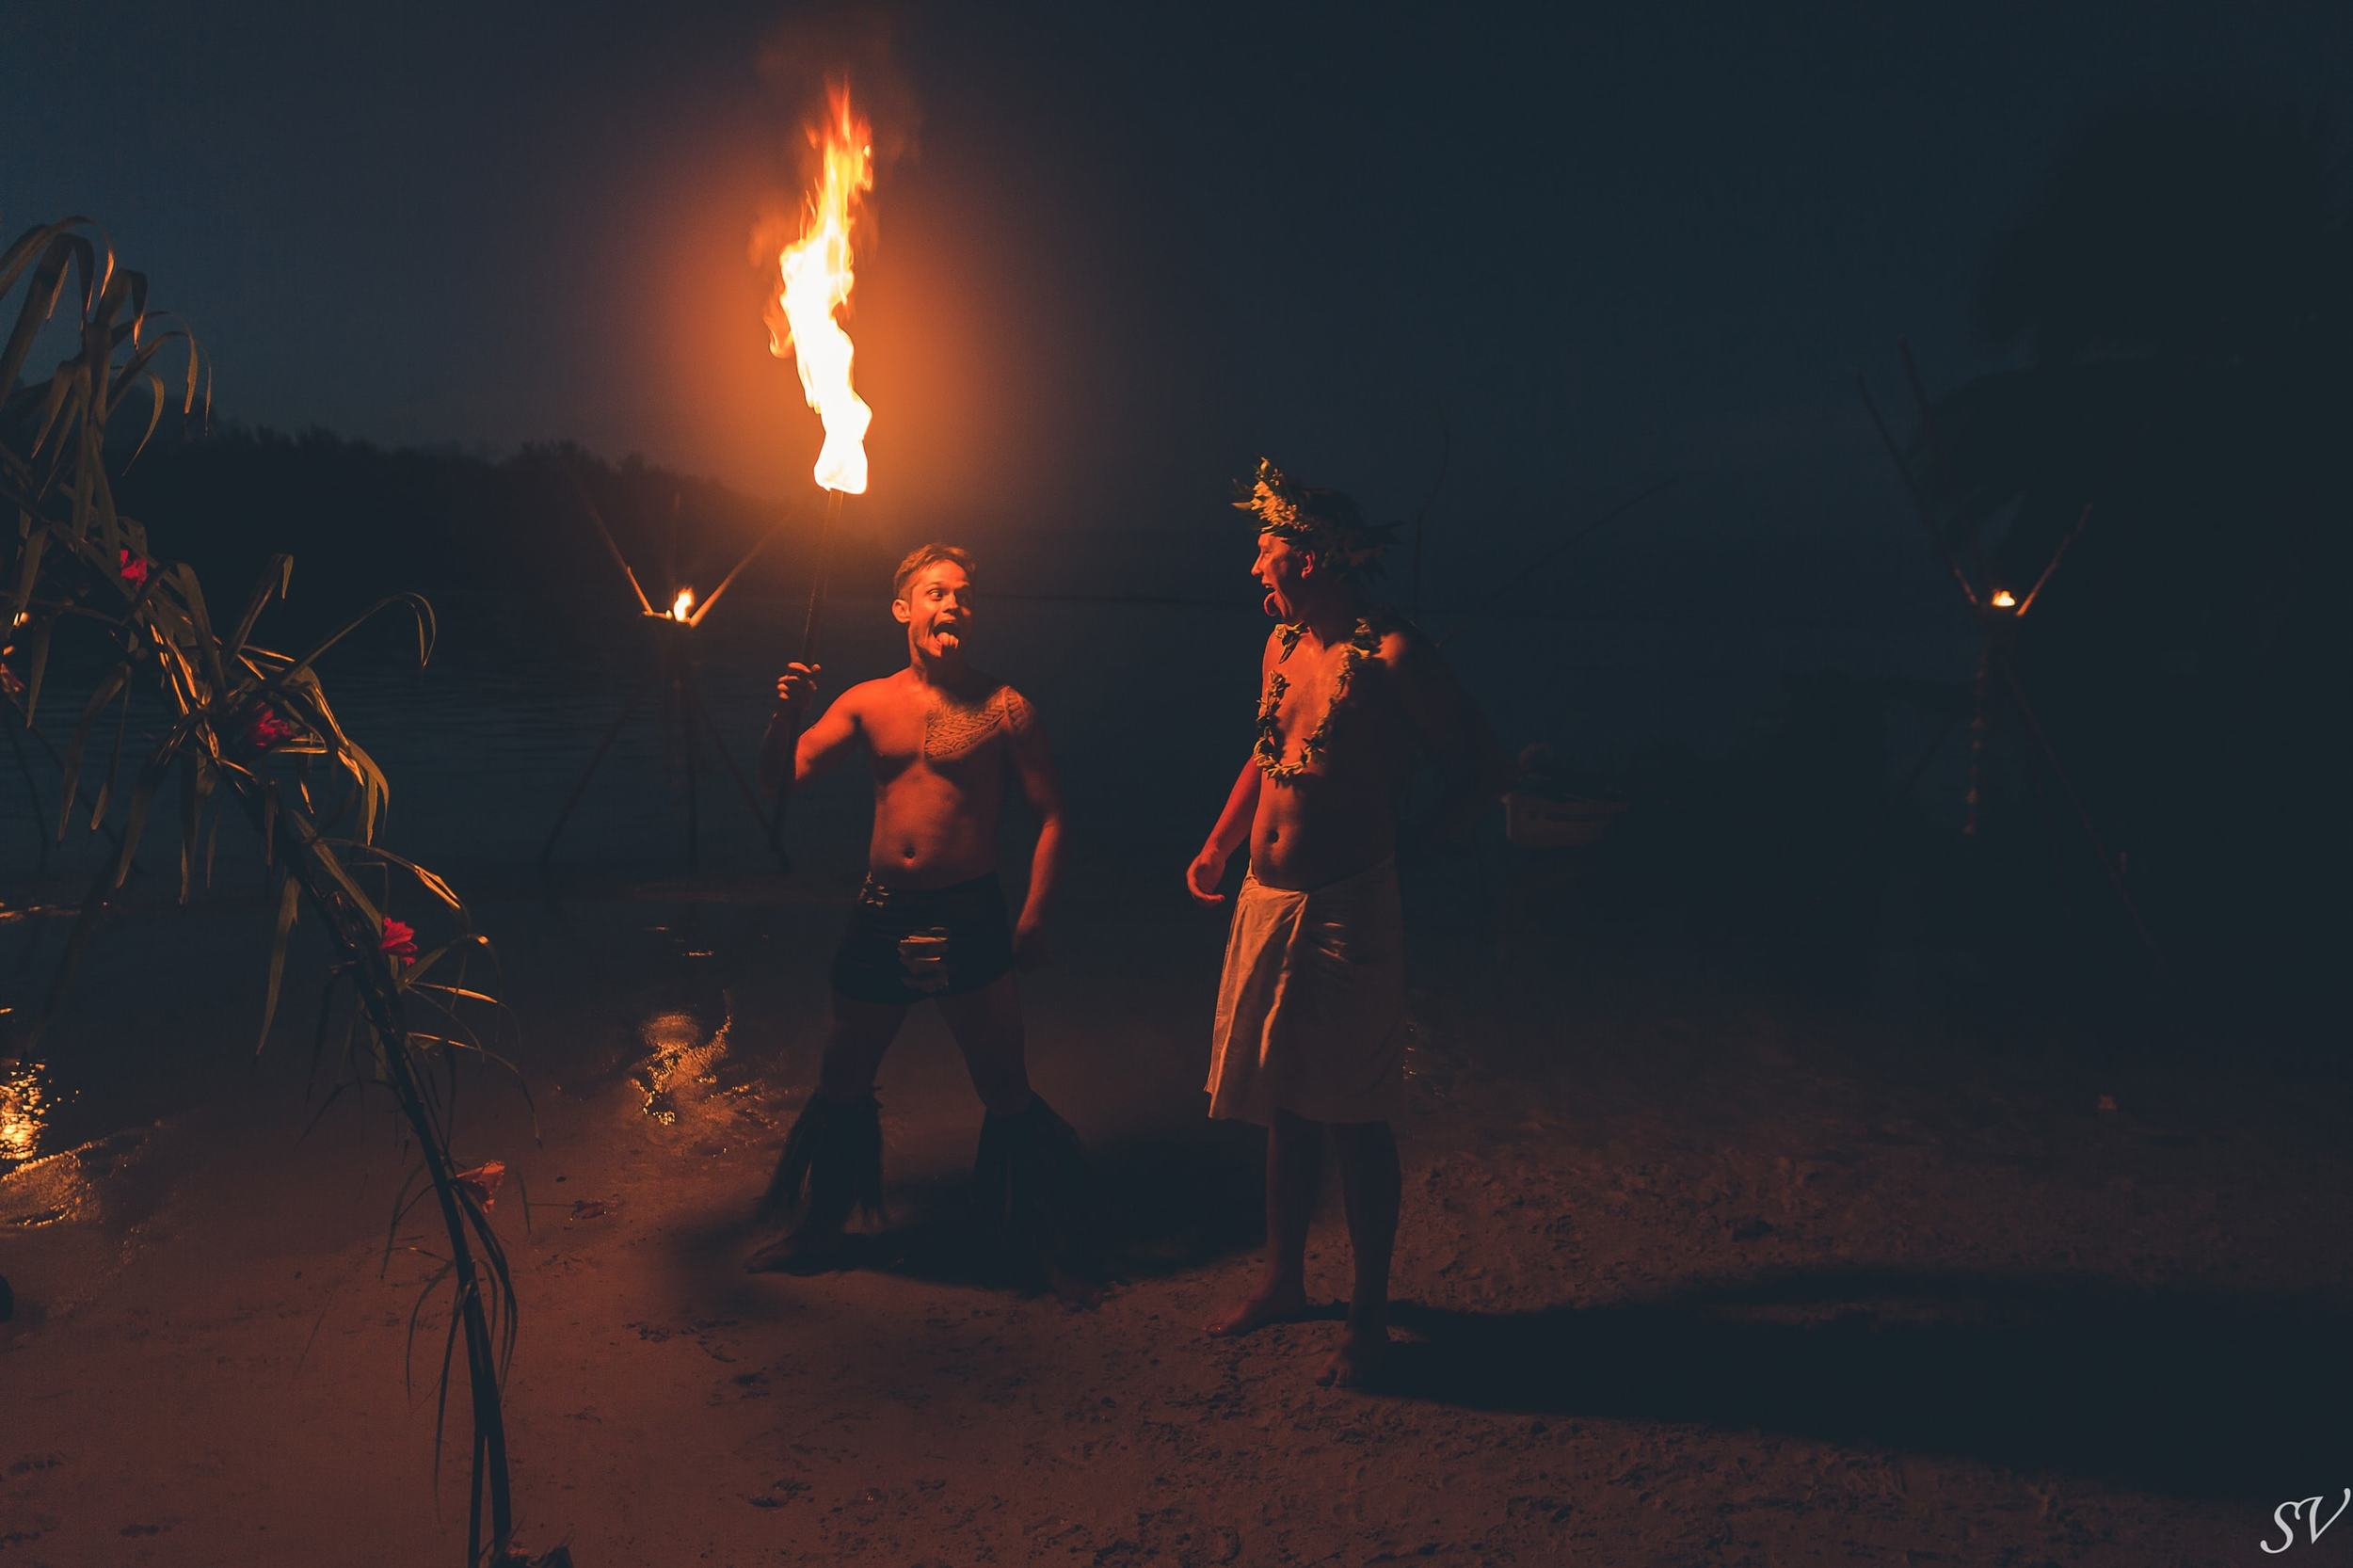 Fire show during the destination wedding